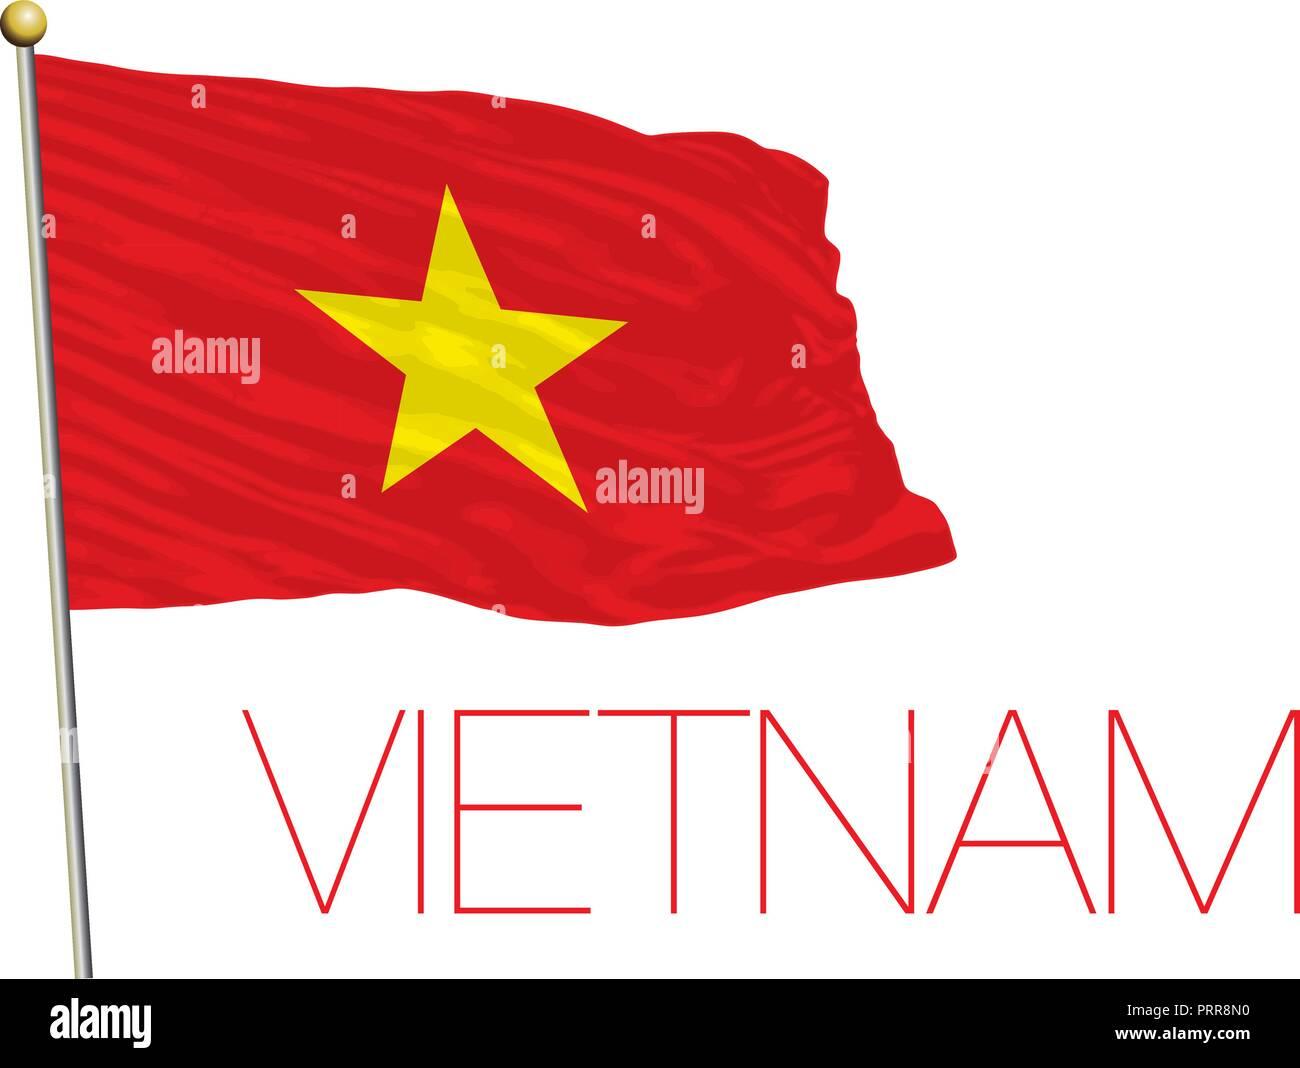 Vietnam official flag, vector illustration - Stock Image